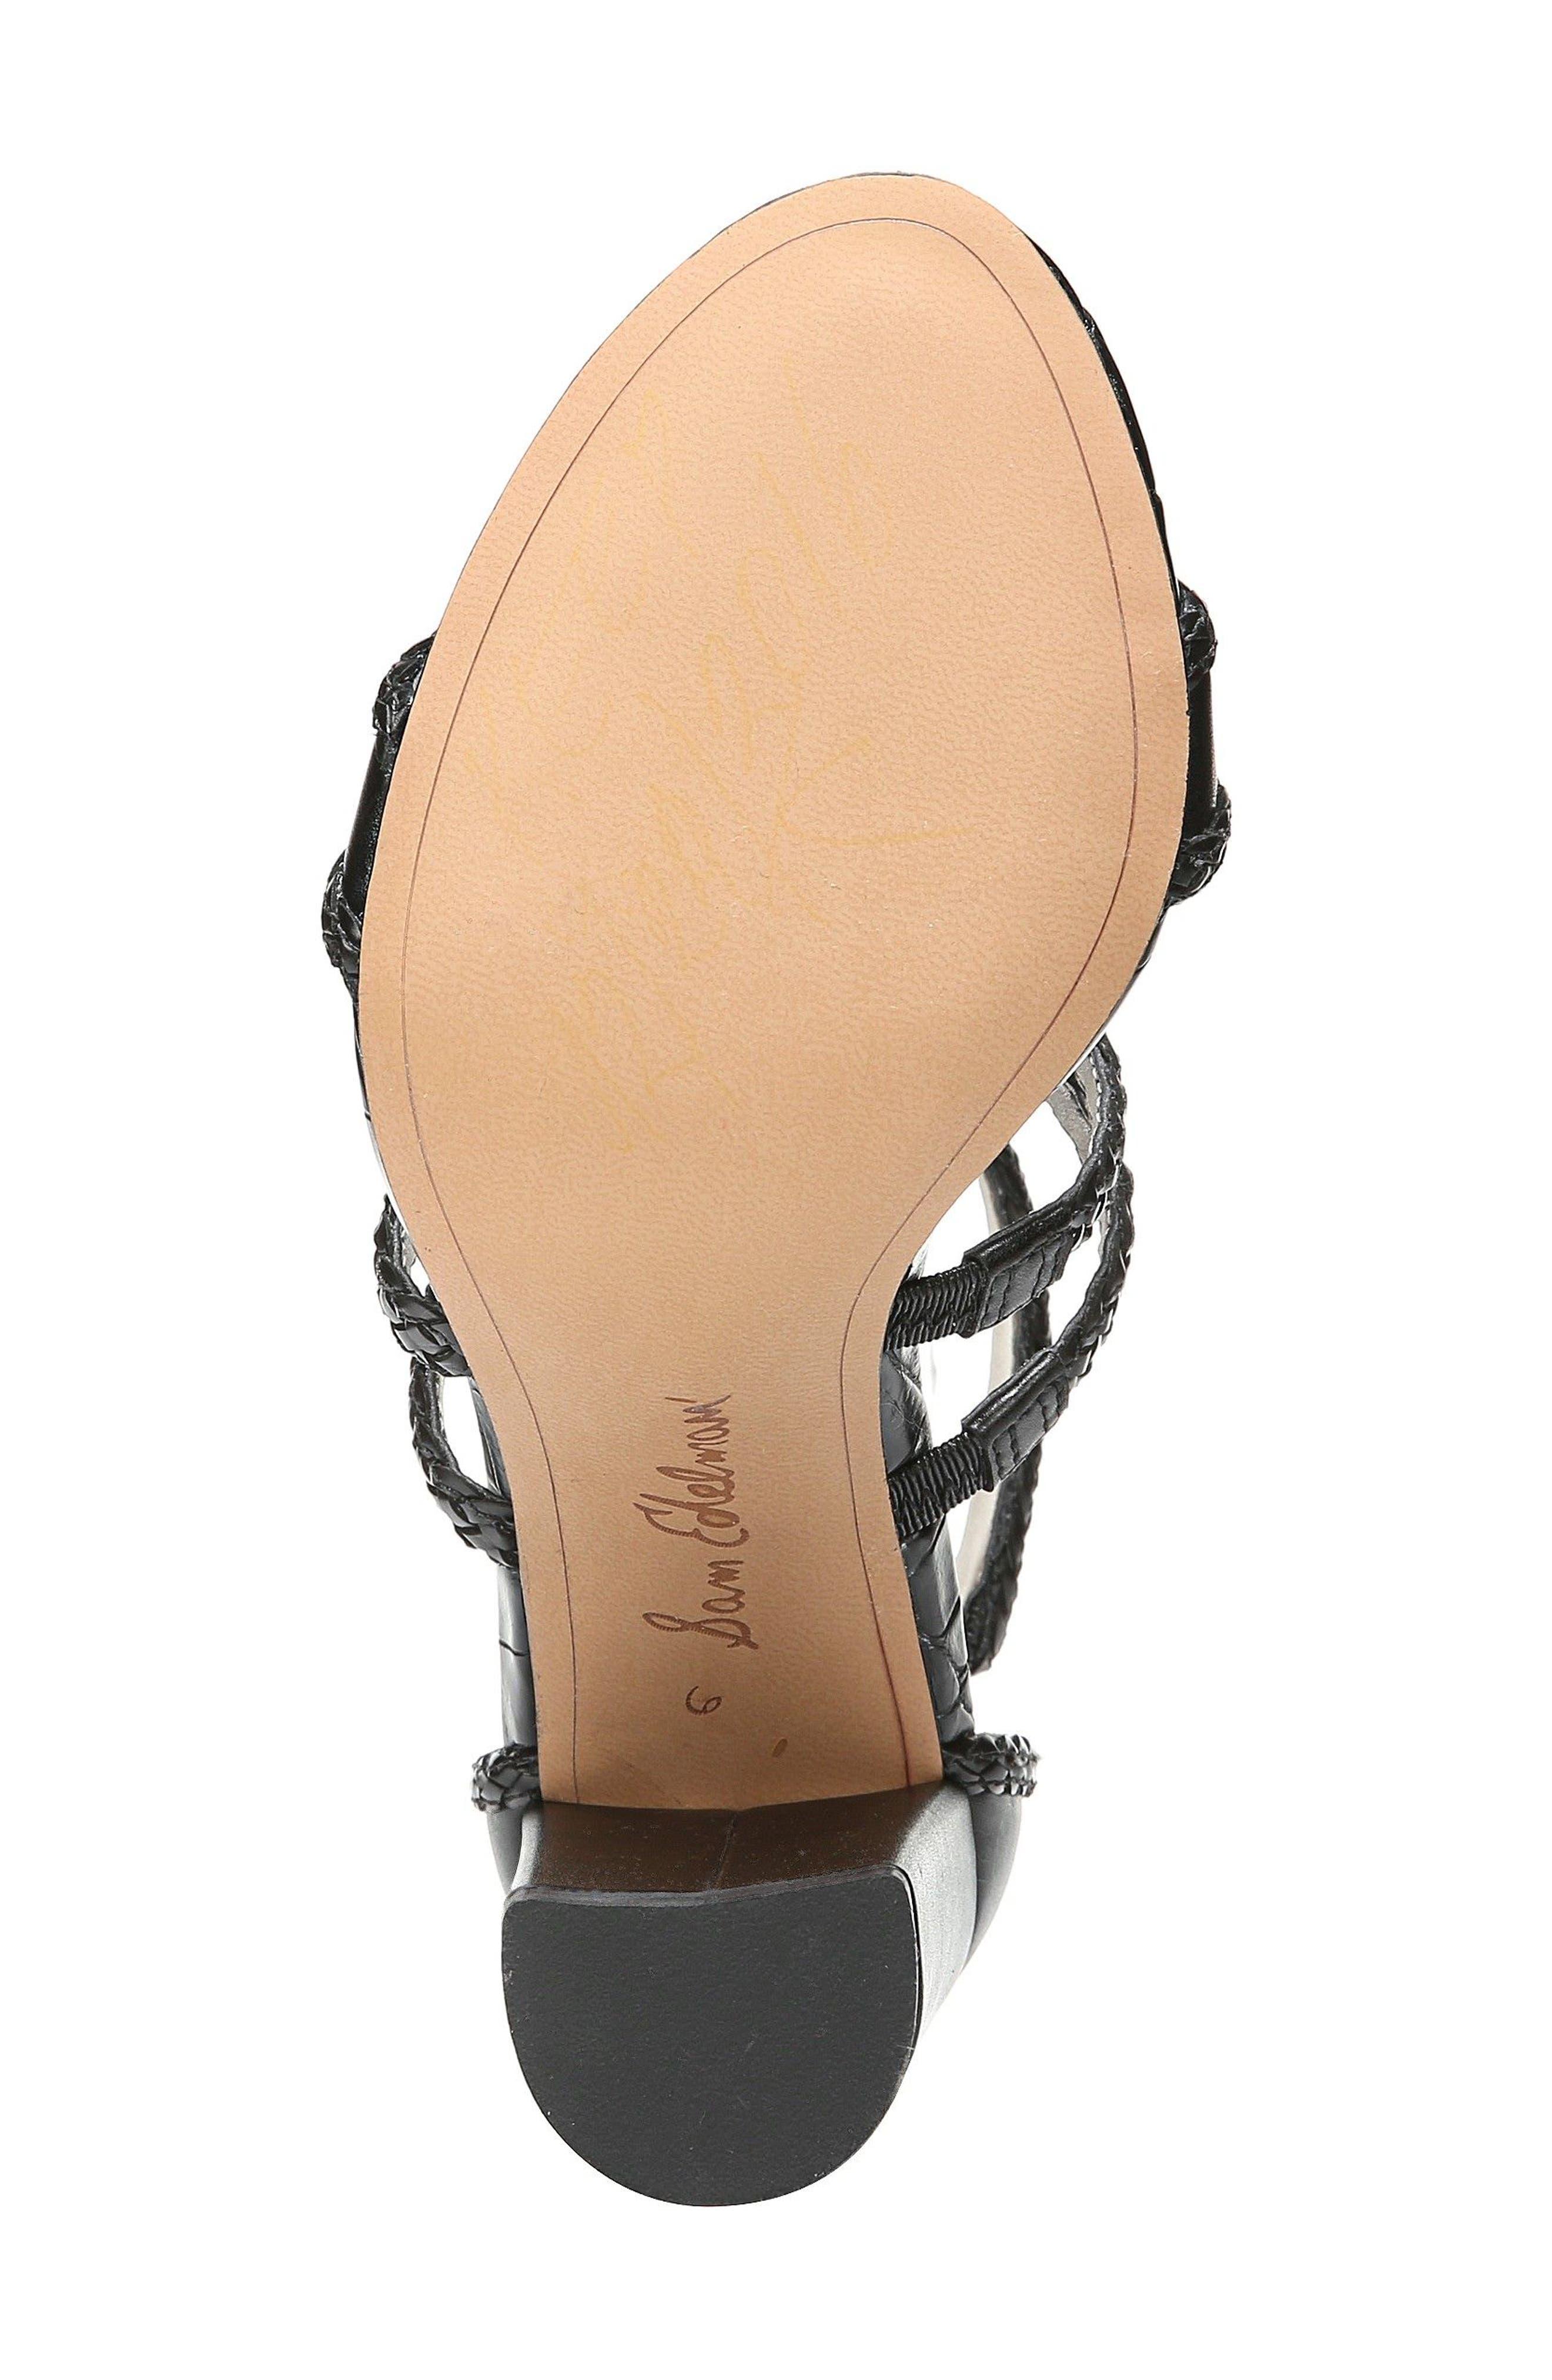 Yordana Woven T-Strap Sandal,                             Alternate thumbnail 6, color,                             001